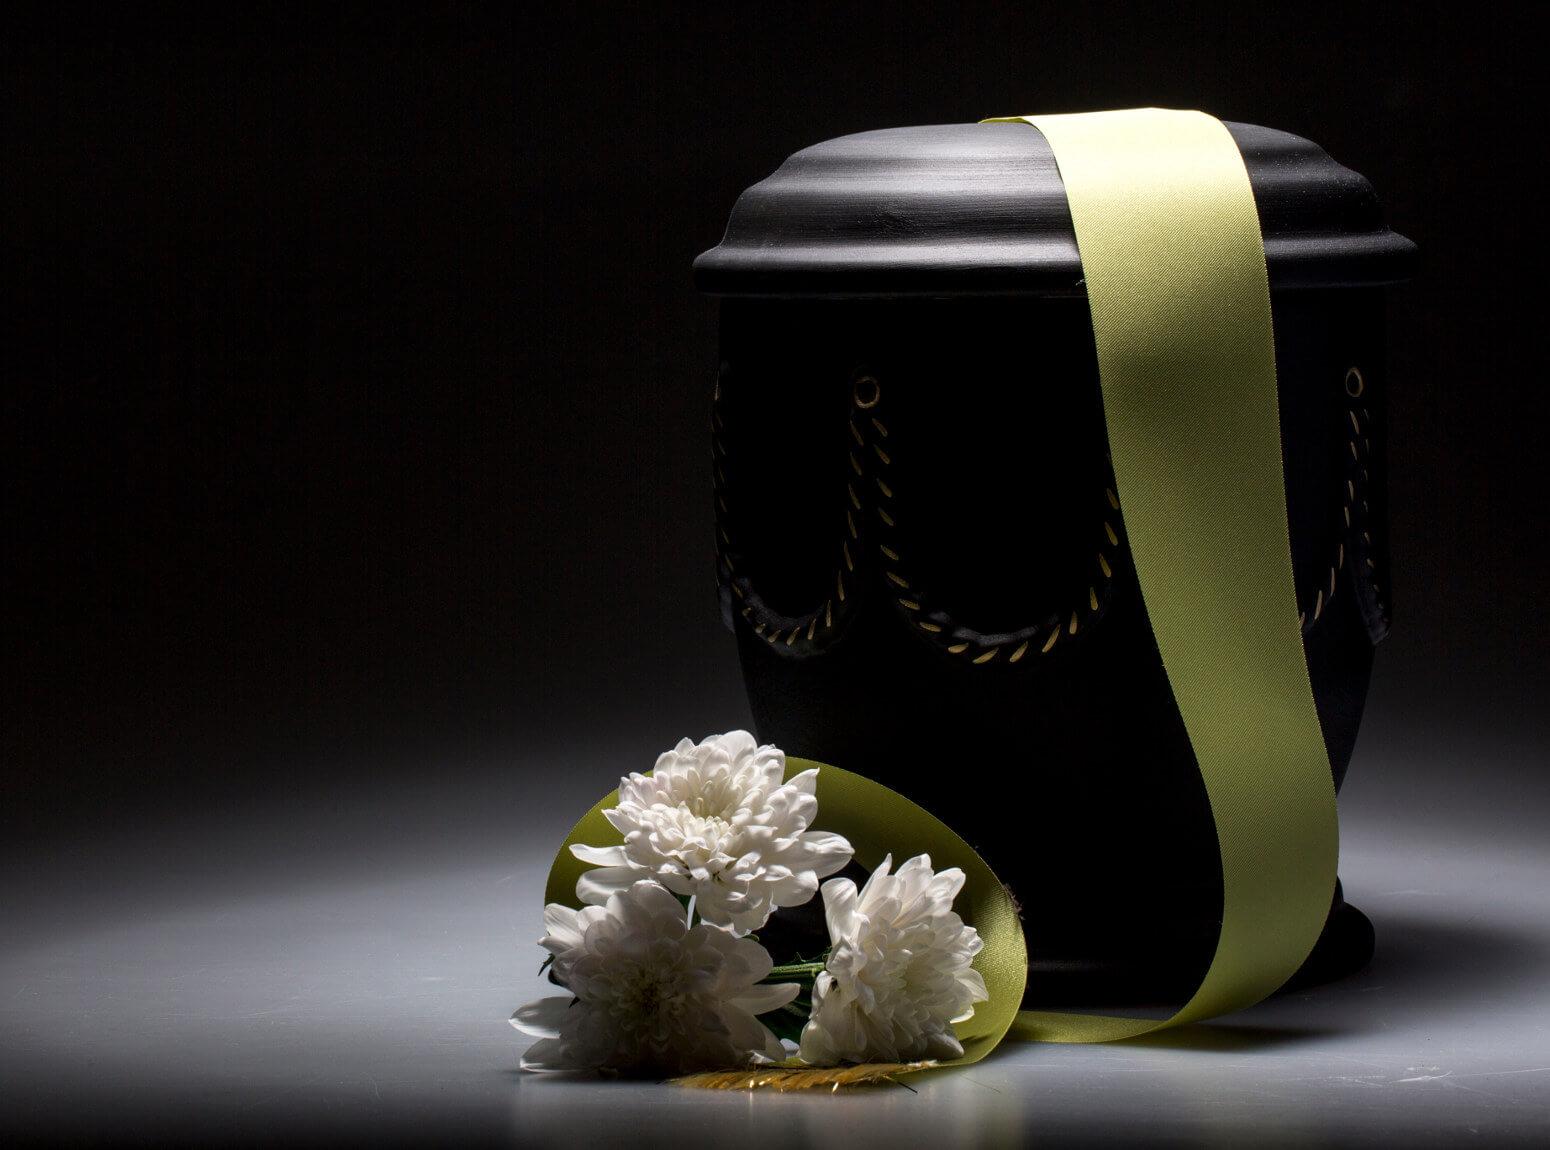 kremacja zwłok - cennik